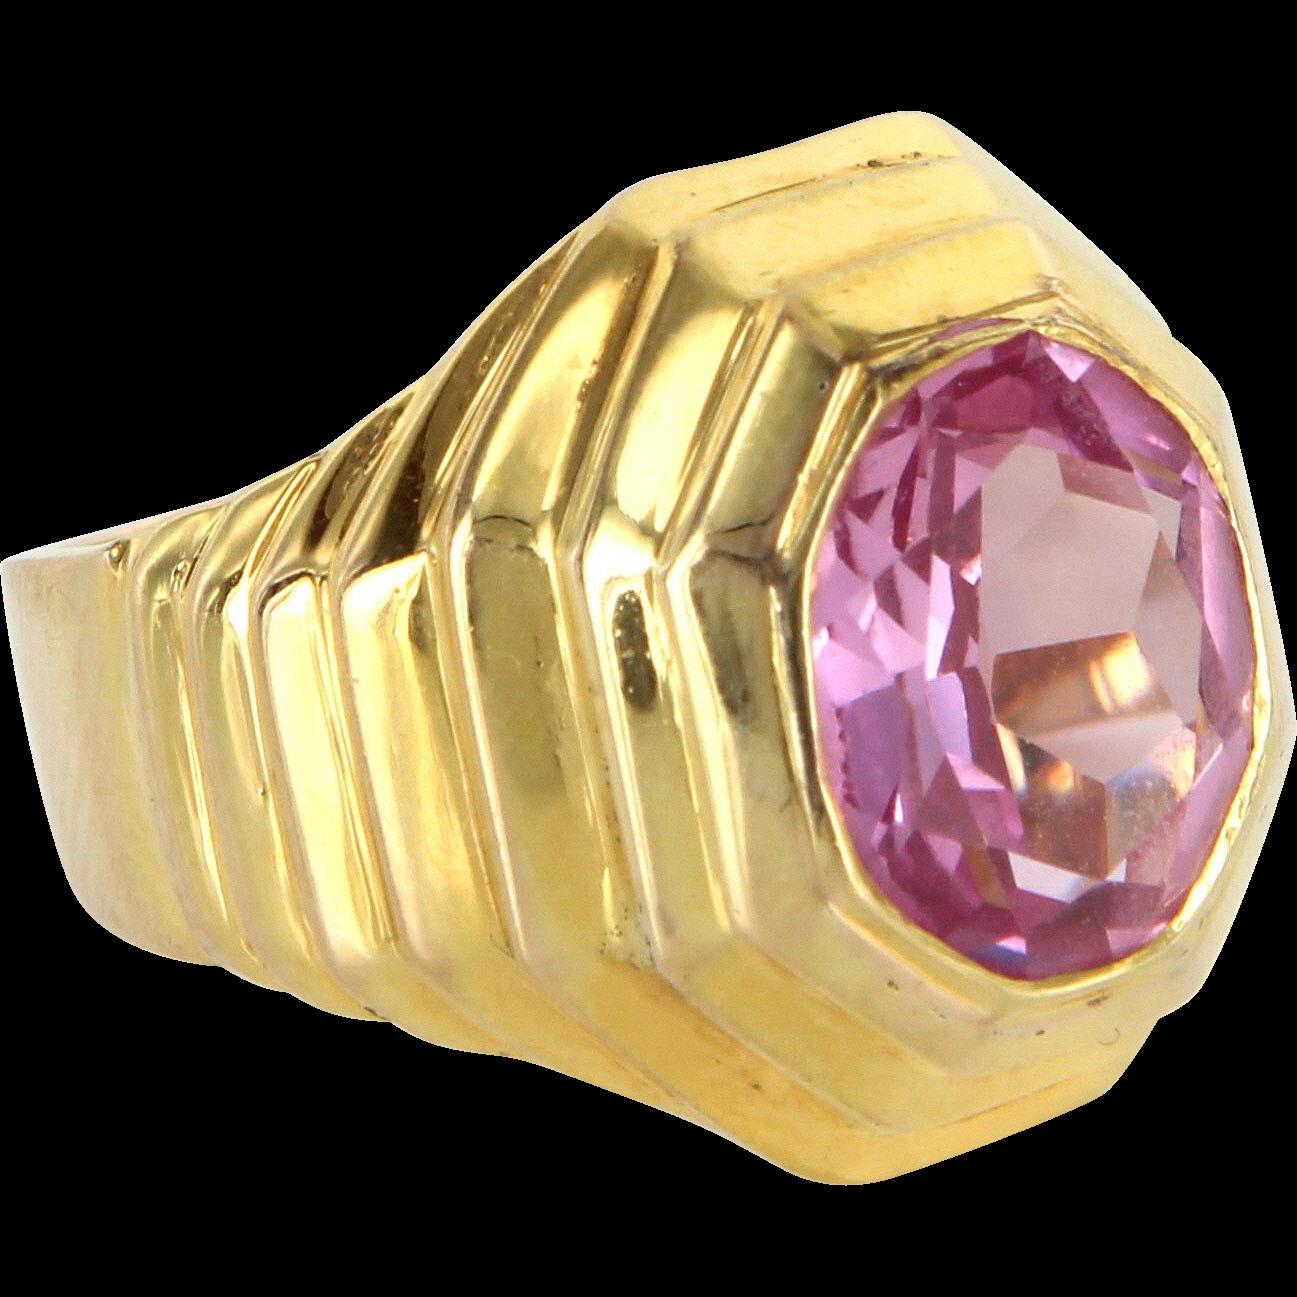 Pink Topaz Retro Vintage Ring 14 Karat Yellow Gold Estate Fine Jewelry Heirloom 7.5